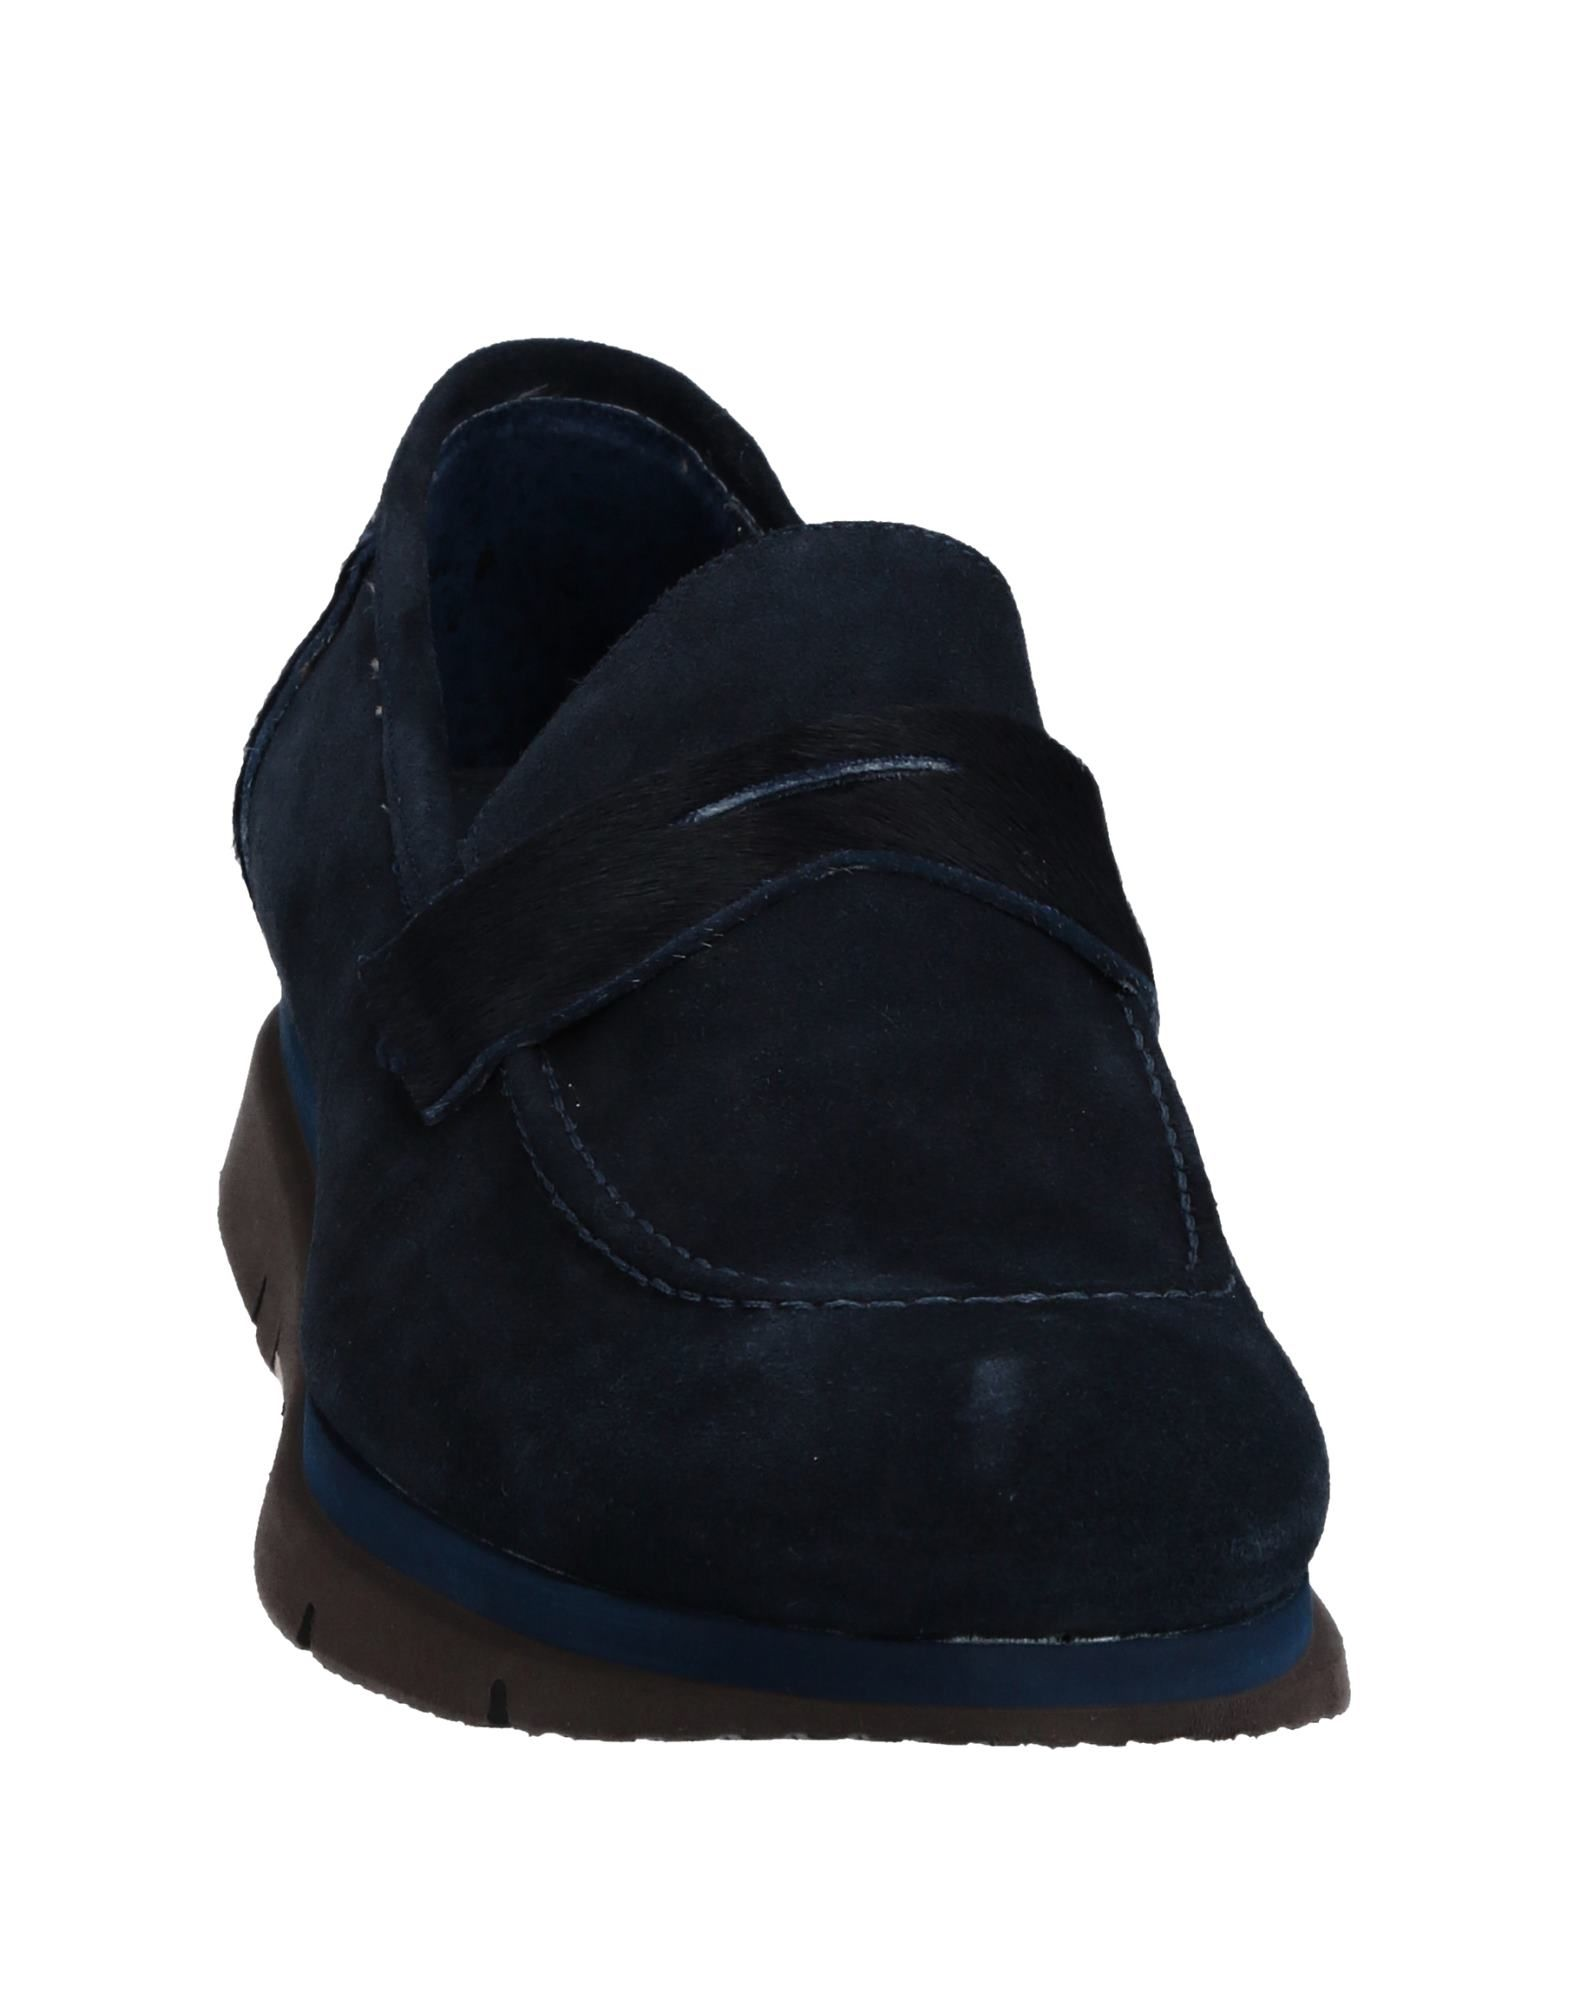 6 Punto 9 Mokassins Mokassins Mokassins Herren  11508526ET Neue Schuhe 9582ad